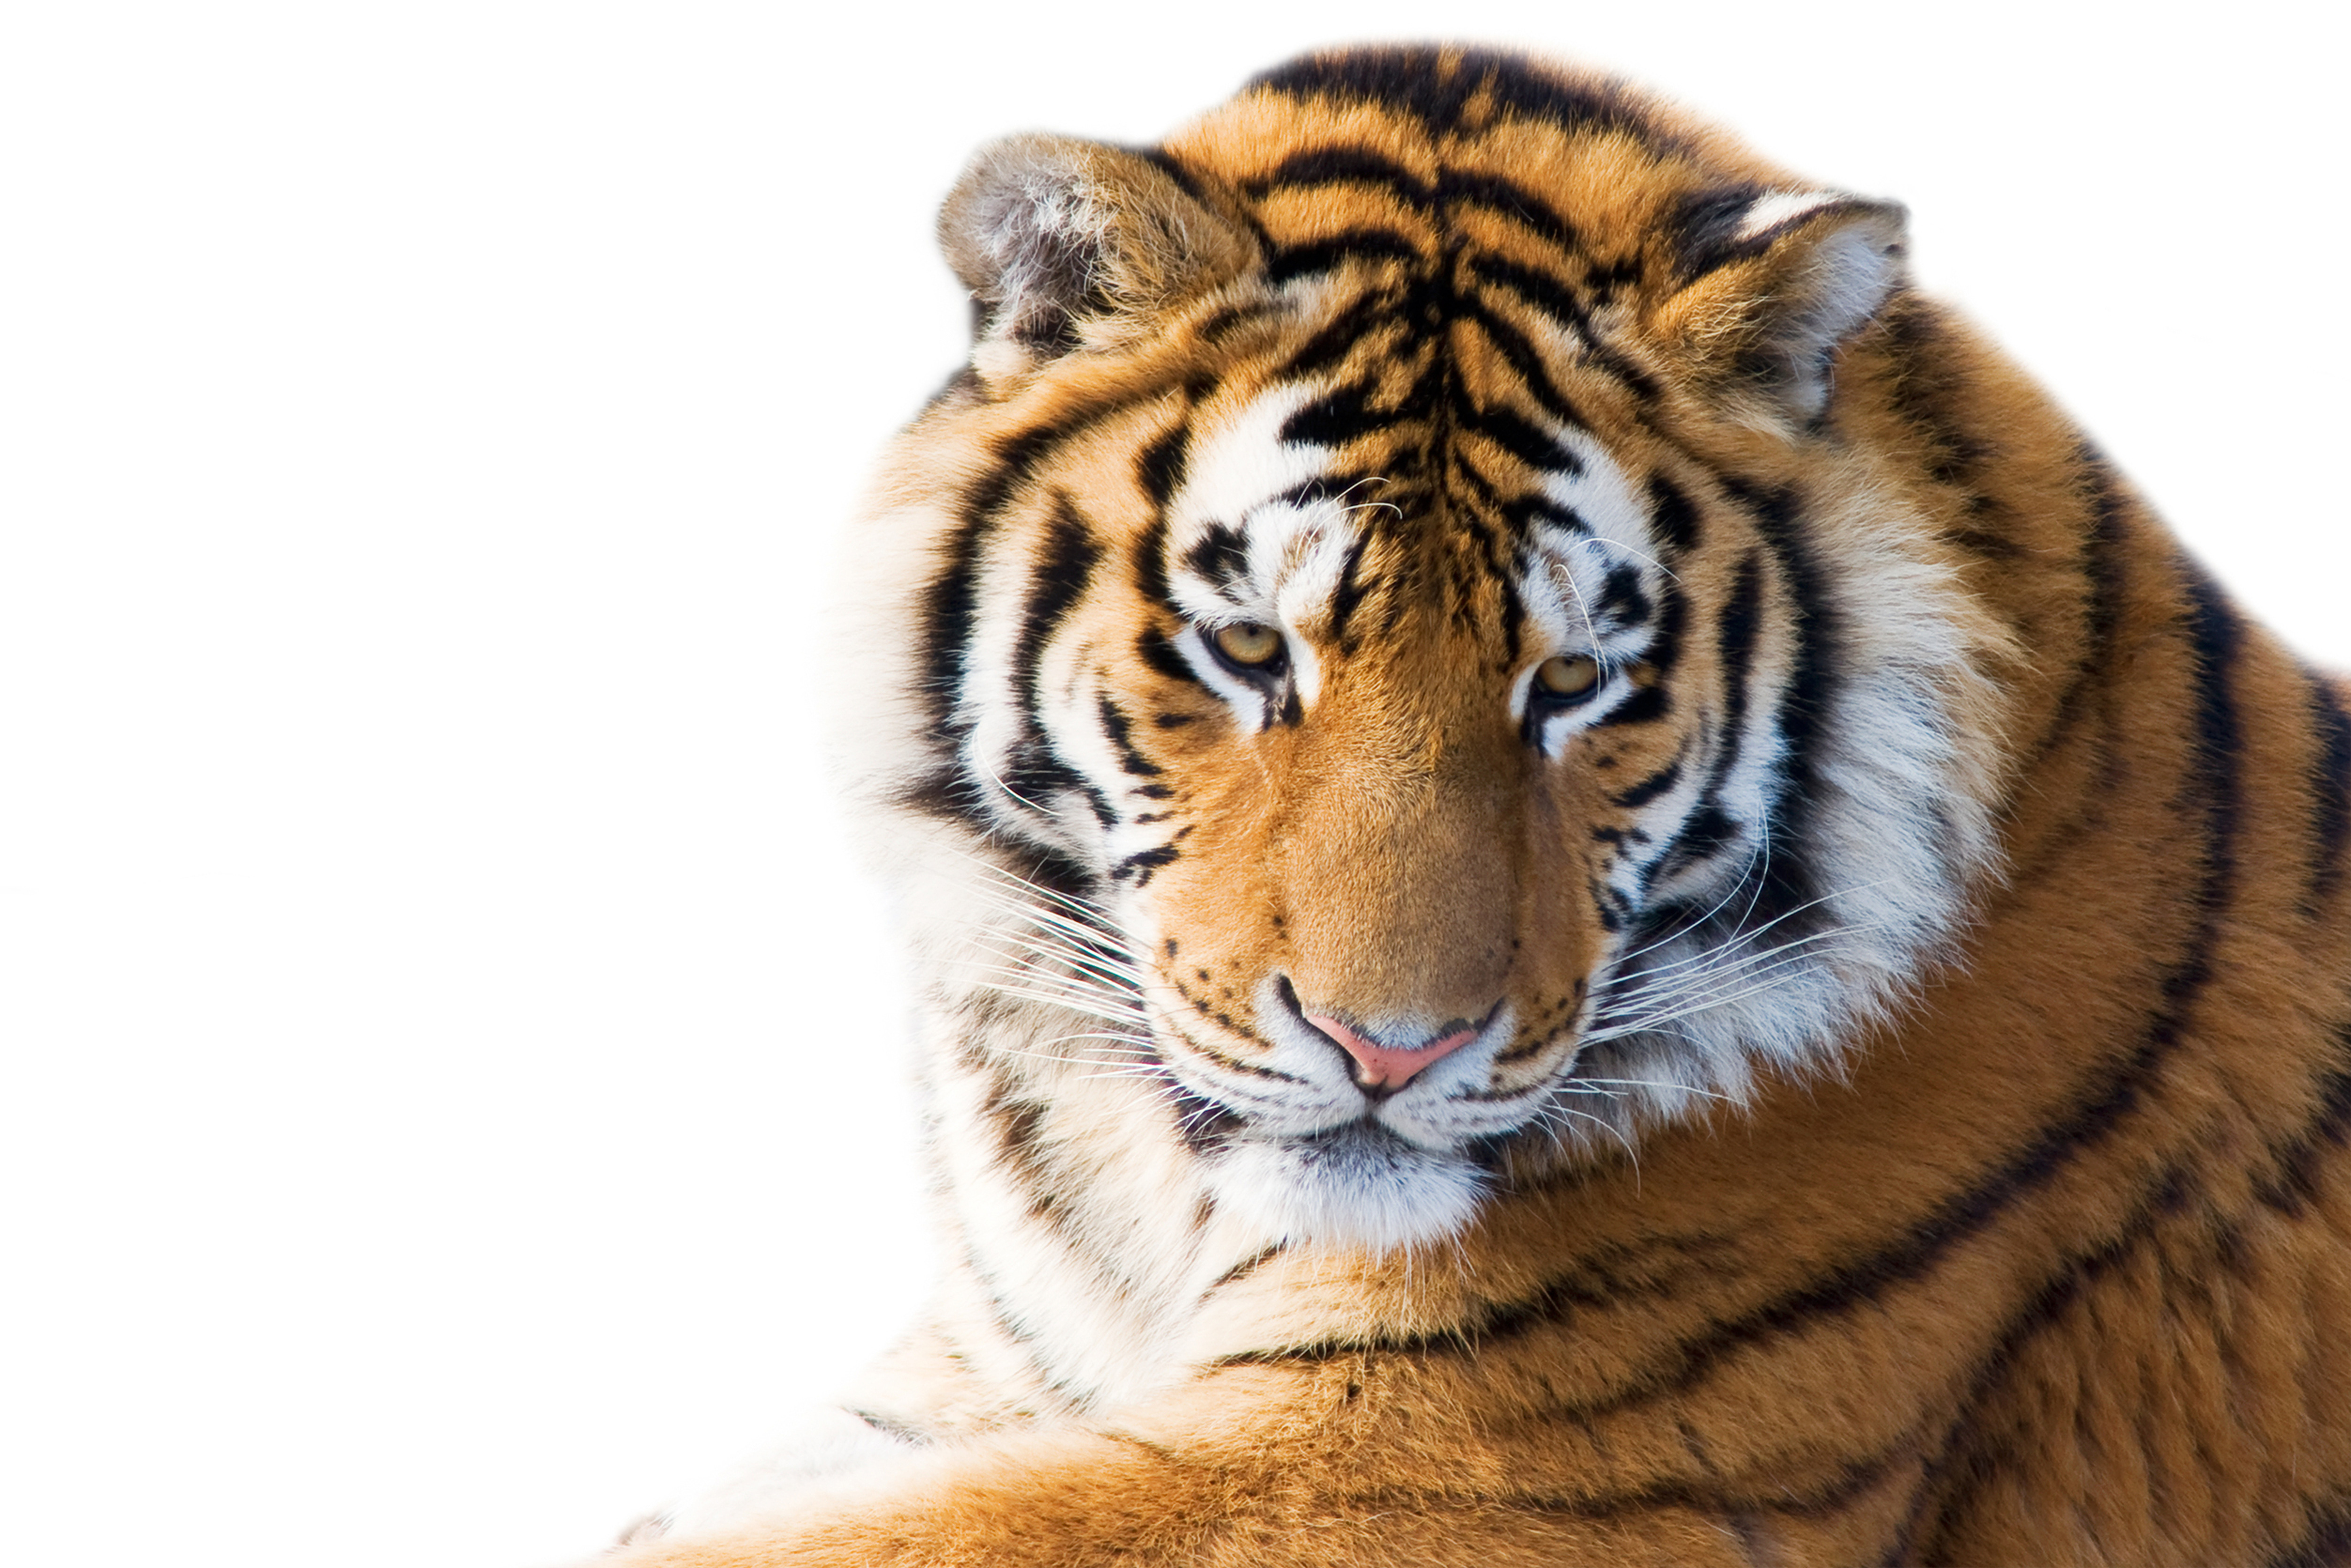 8k Animal Wallpaper Download: Big Cats Tiger Wallpaper